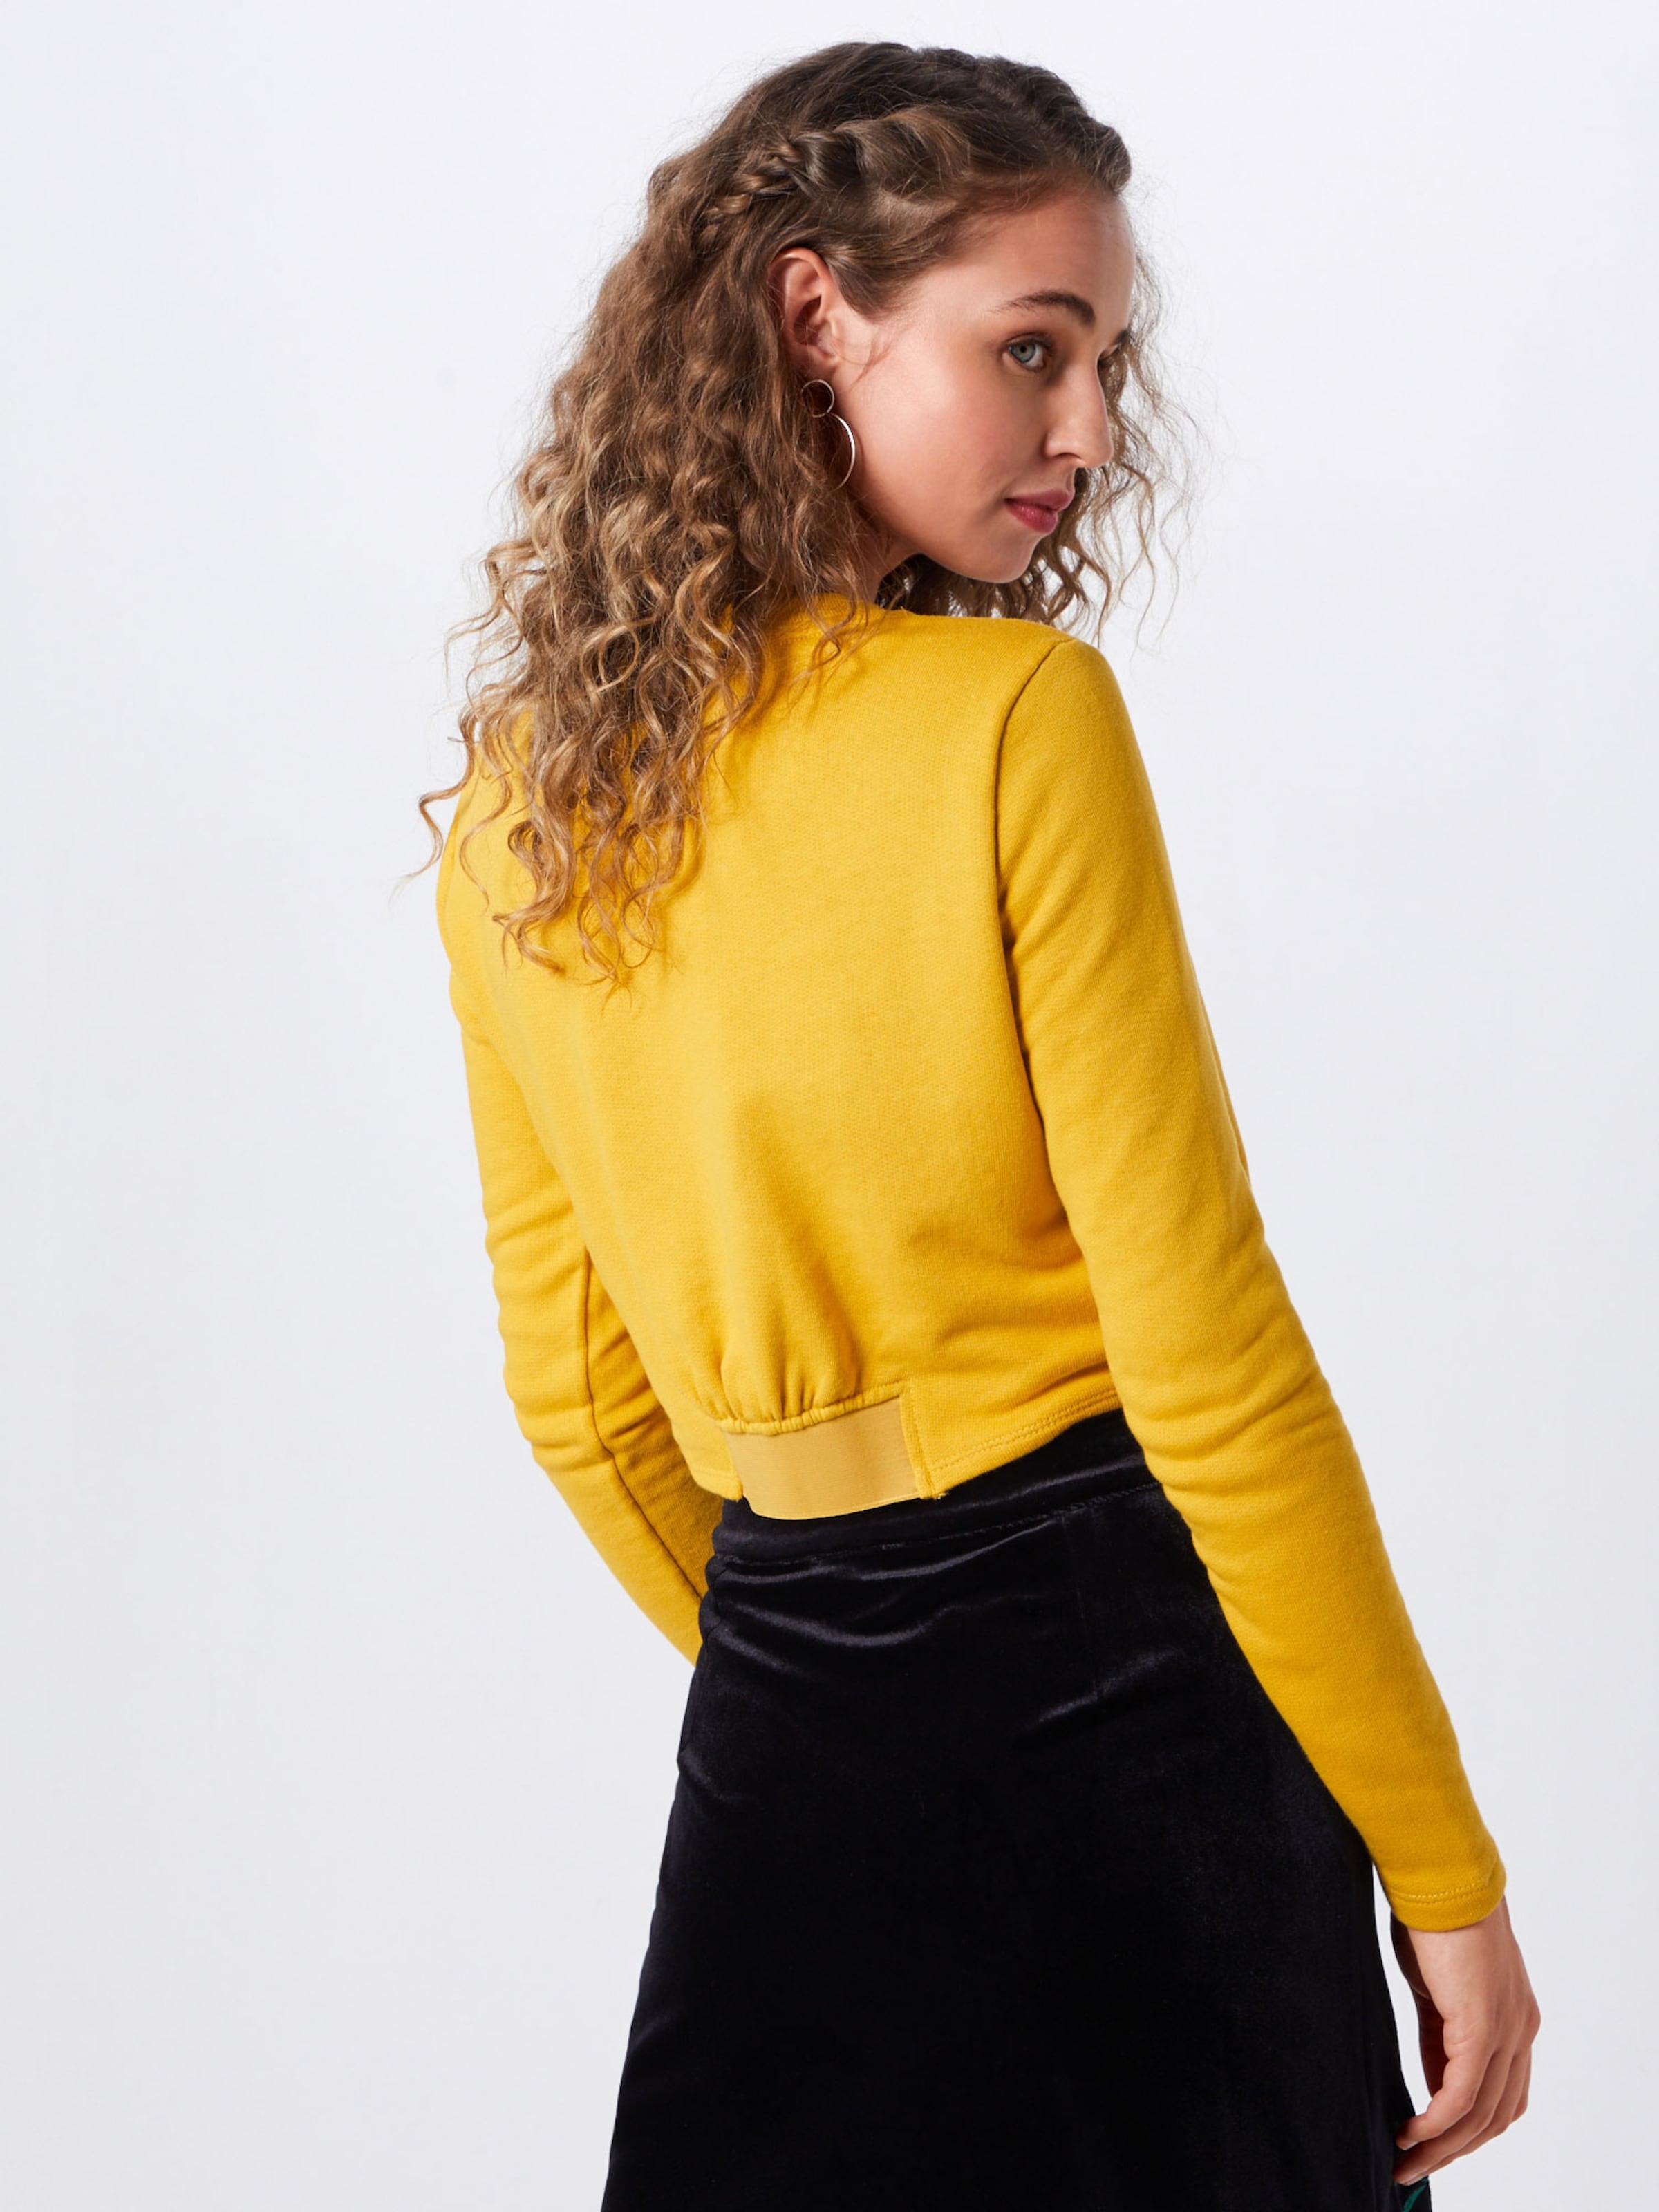 May L Curry Sweatshirt 'nmecem s Cropped Fdx' Noisy Sweat In LR543Ajq